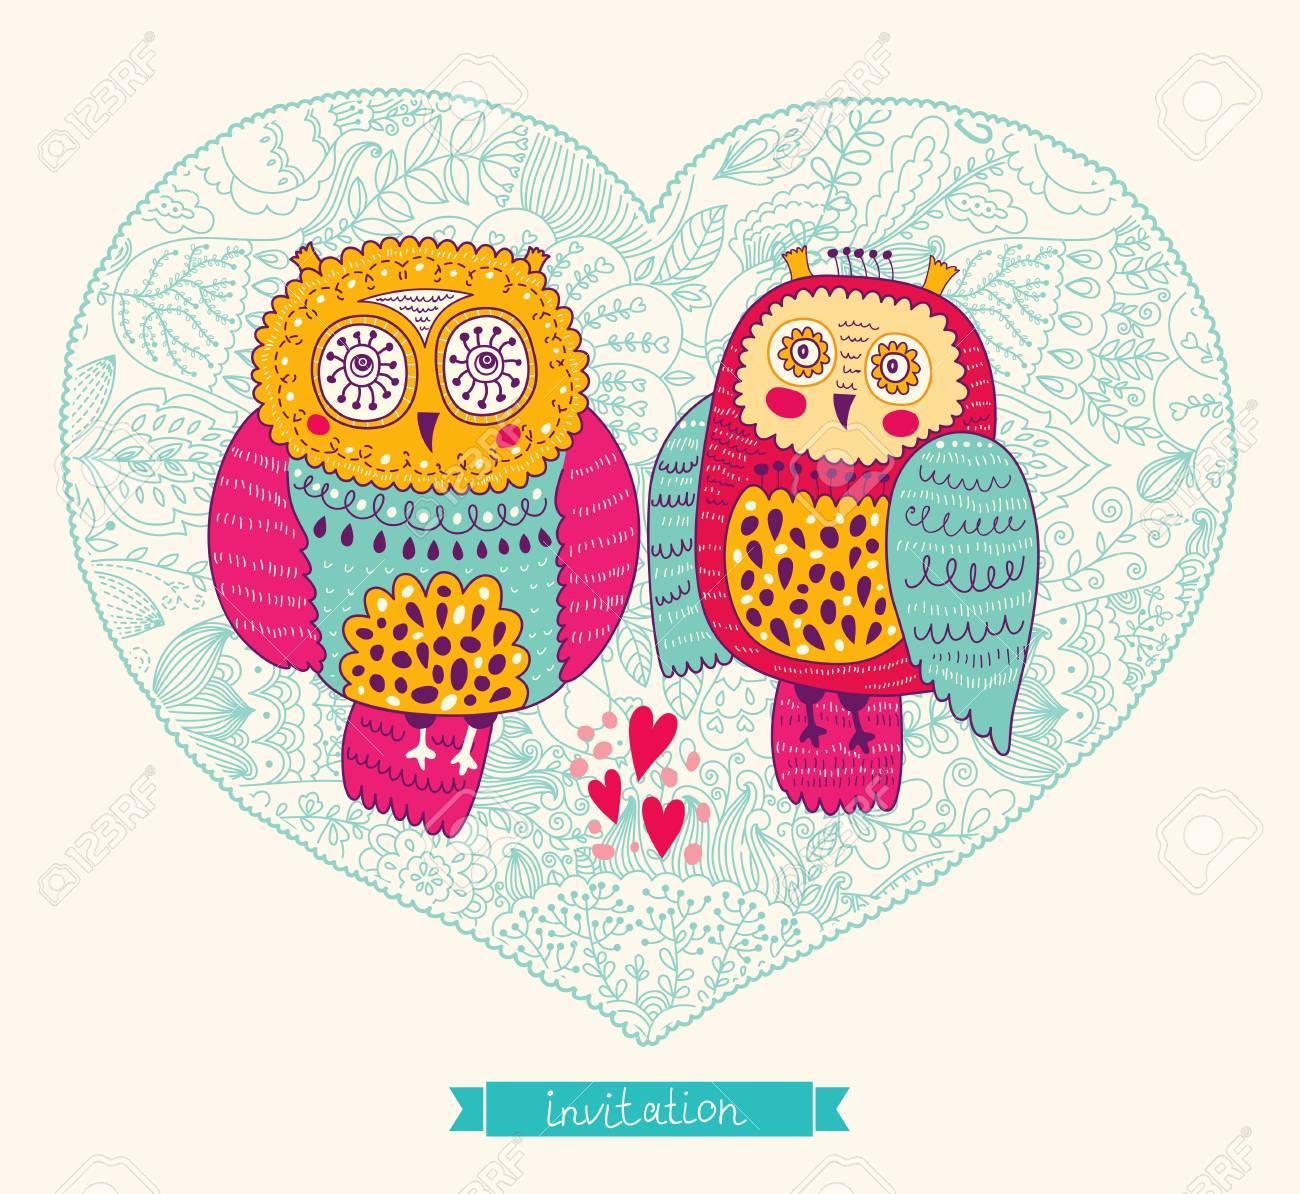 Vector wedding invitation with cute owls Stock Vector - 20331318